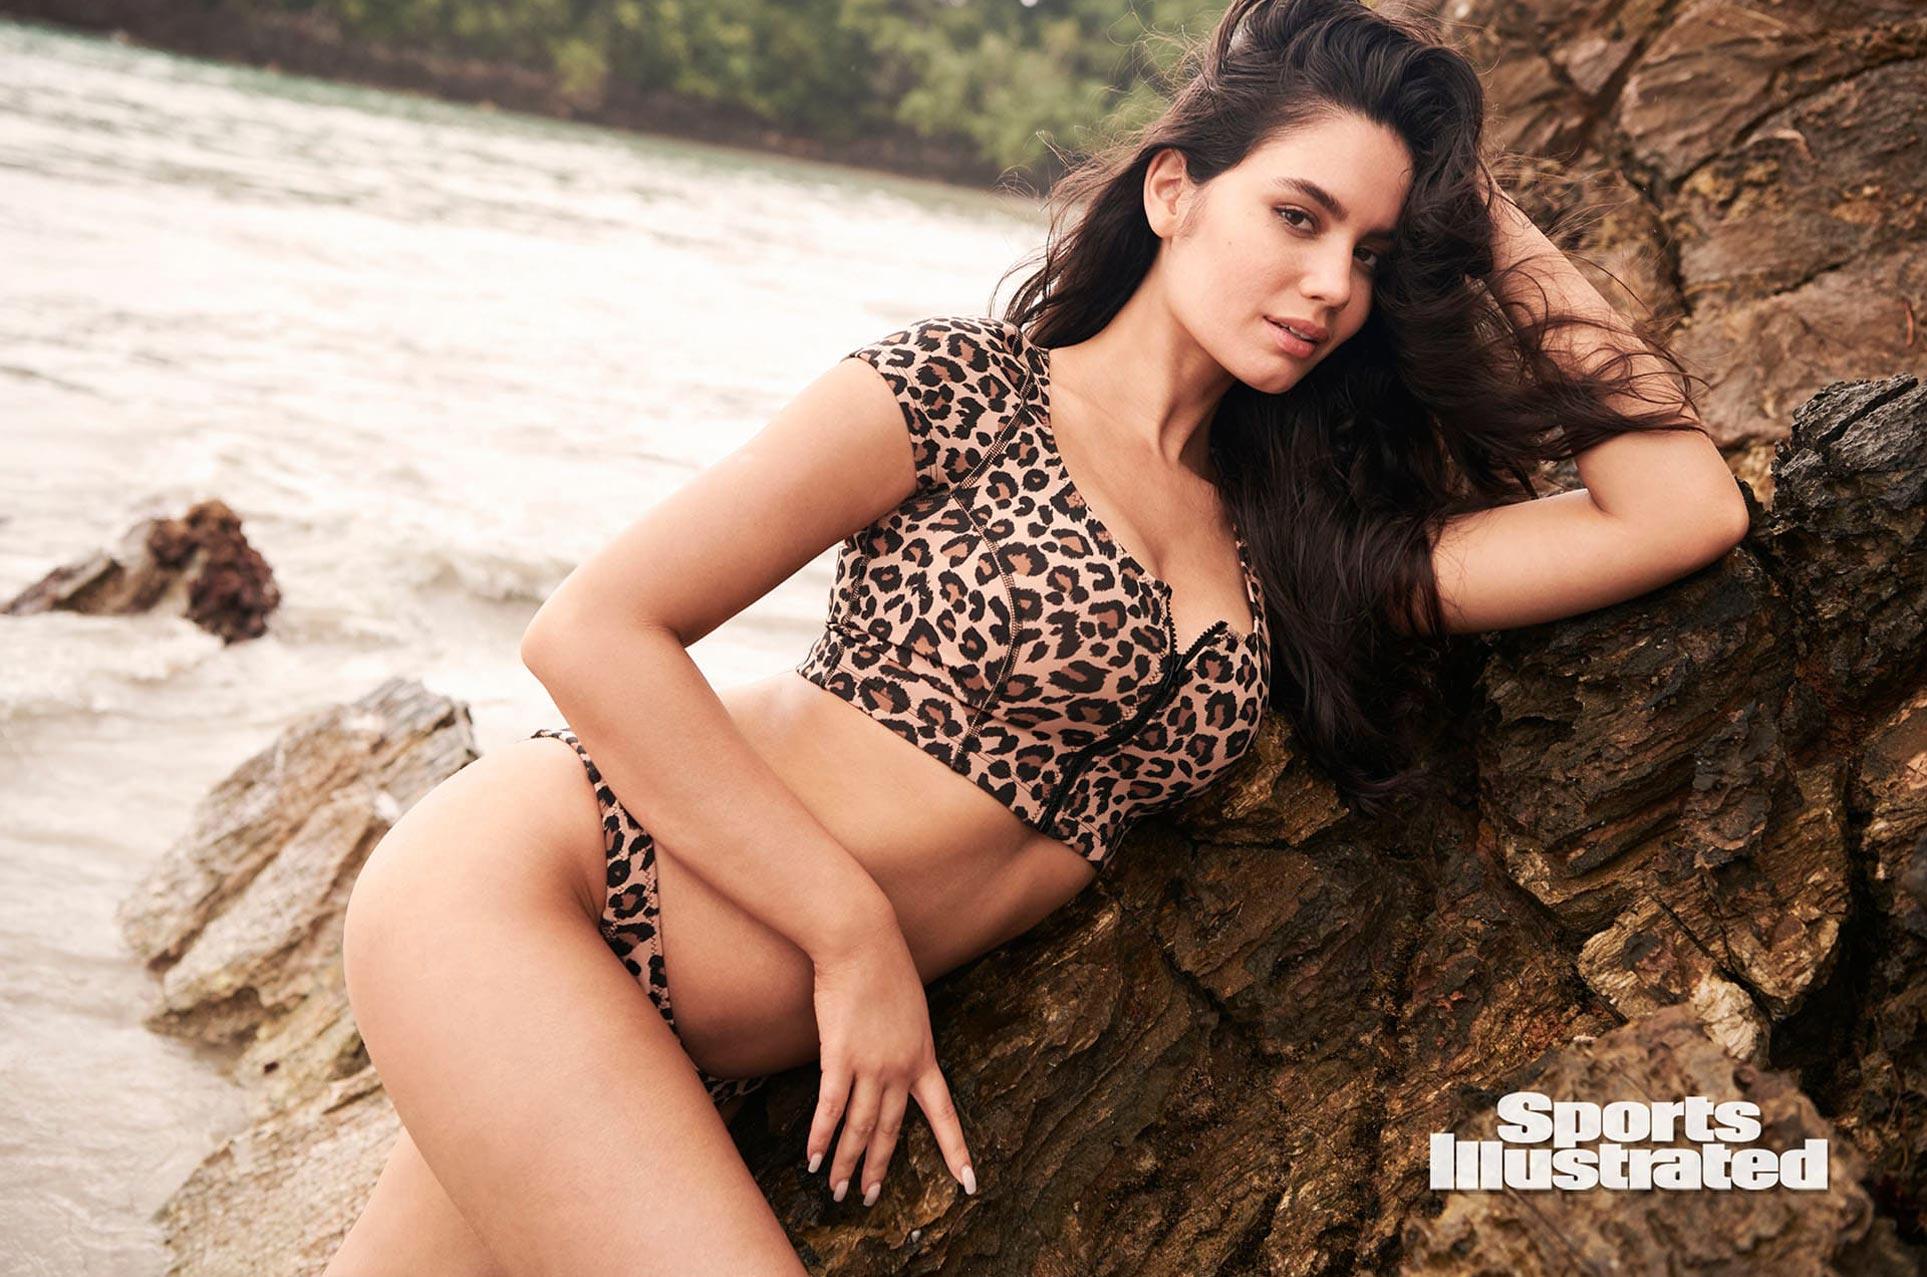 Энн де Паула в каталоге купальников Sports Illustrated Swimsuit 2020 / фото 13